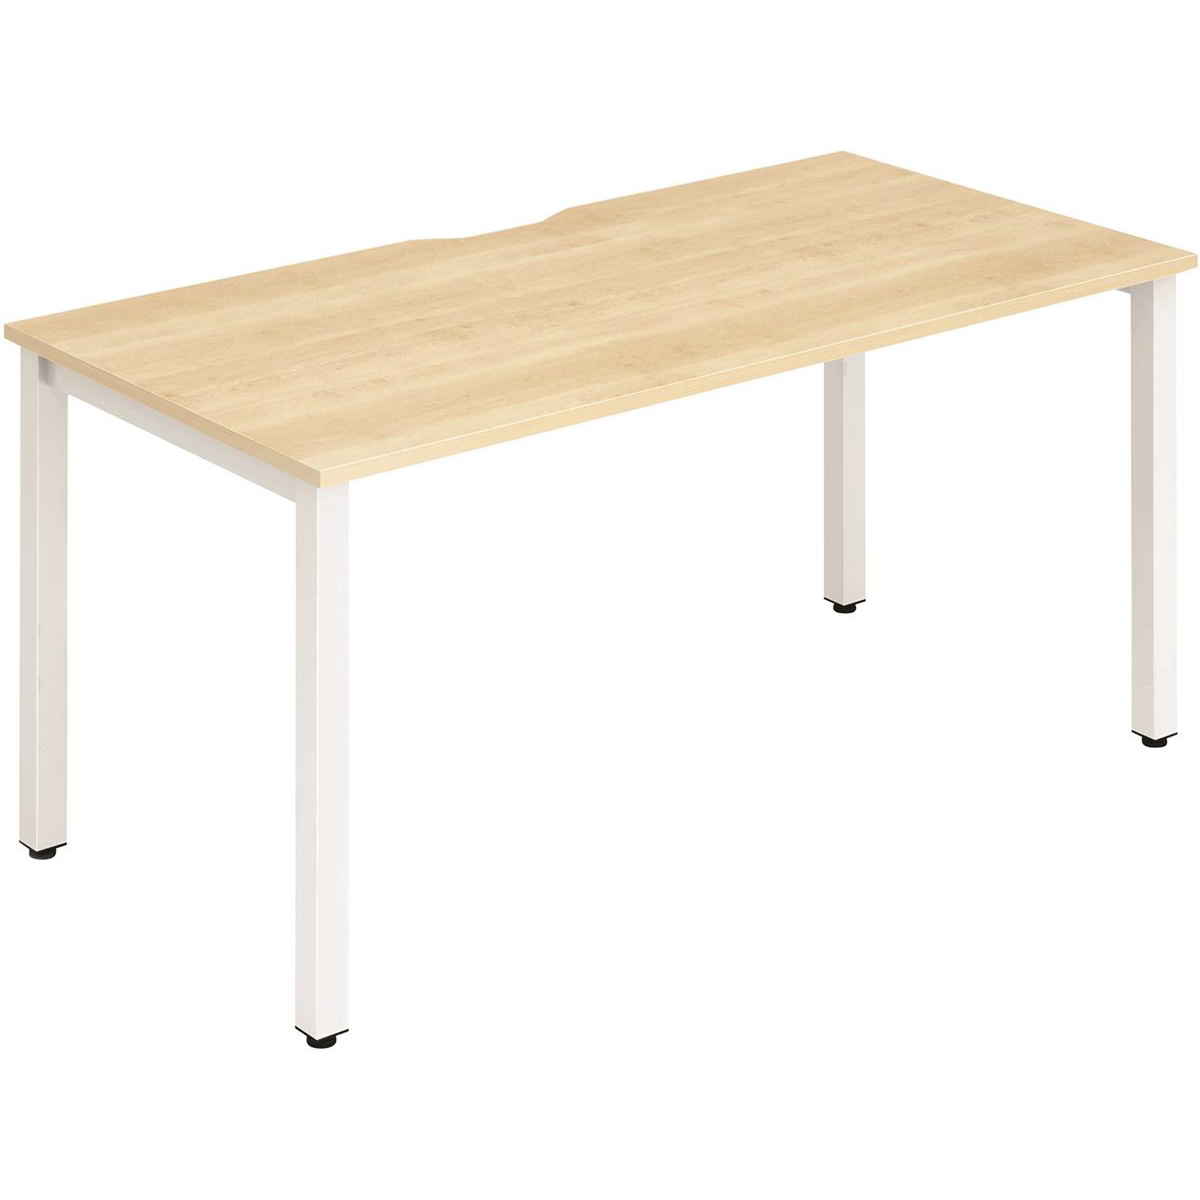 Trexus Bench Desk Individual White Leg 1200x800mm Maple Ref BE116